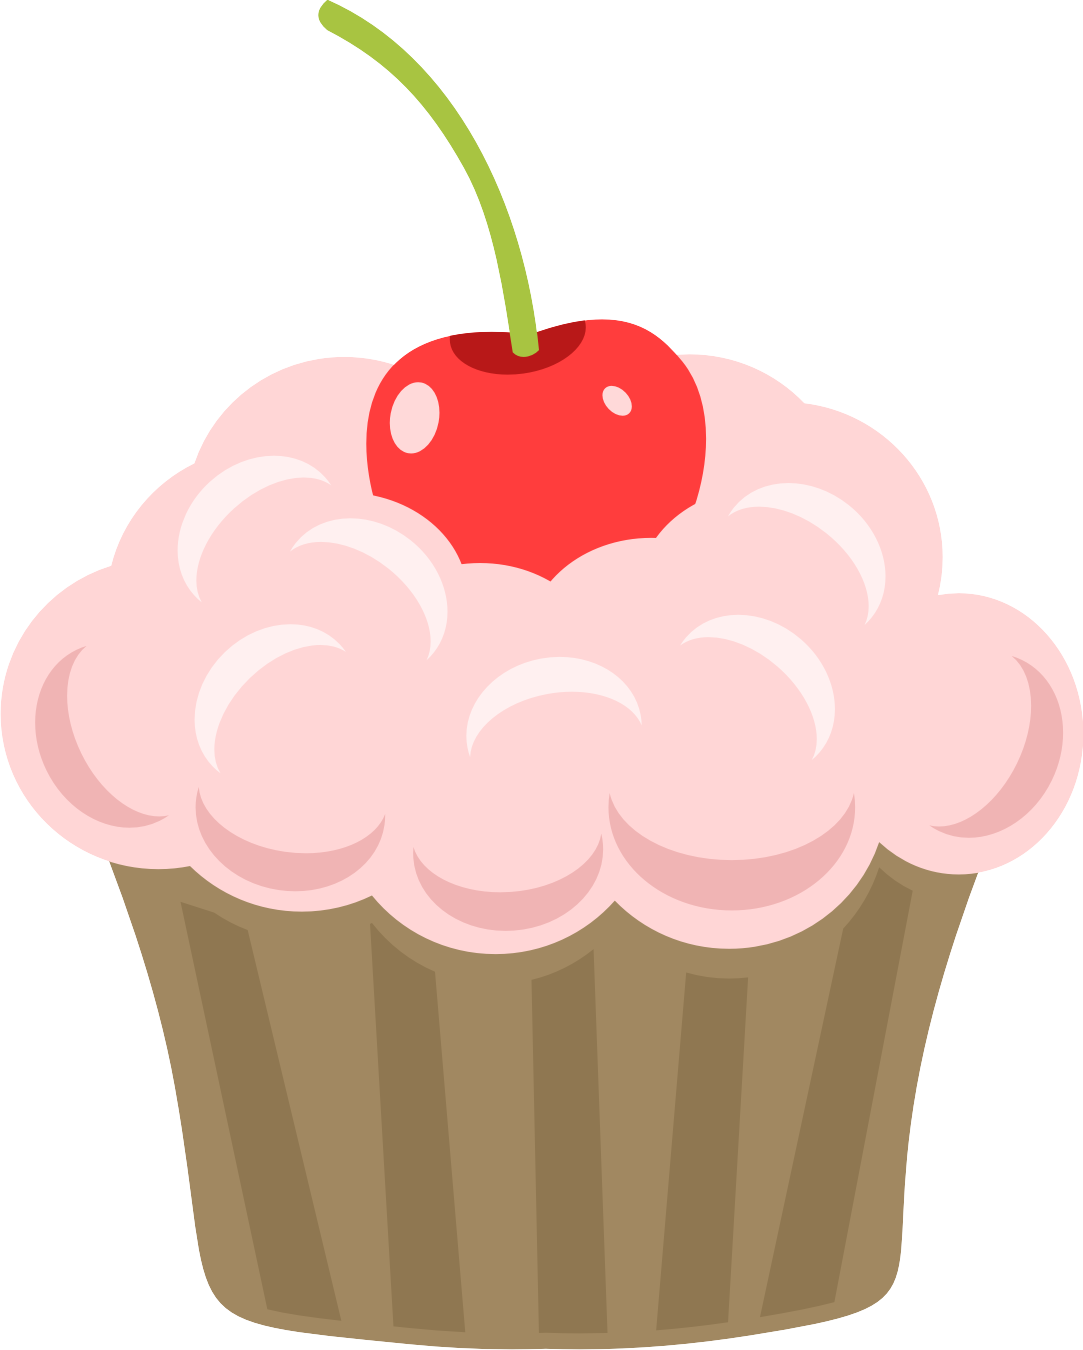 Cupcake tree clipart. Free printable at getdrawings